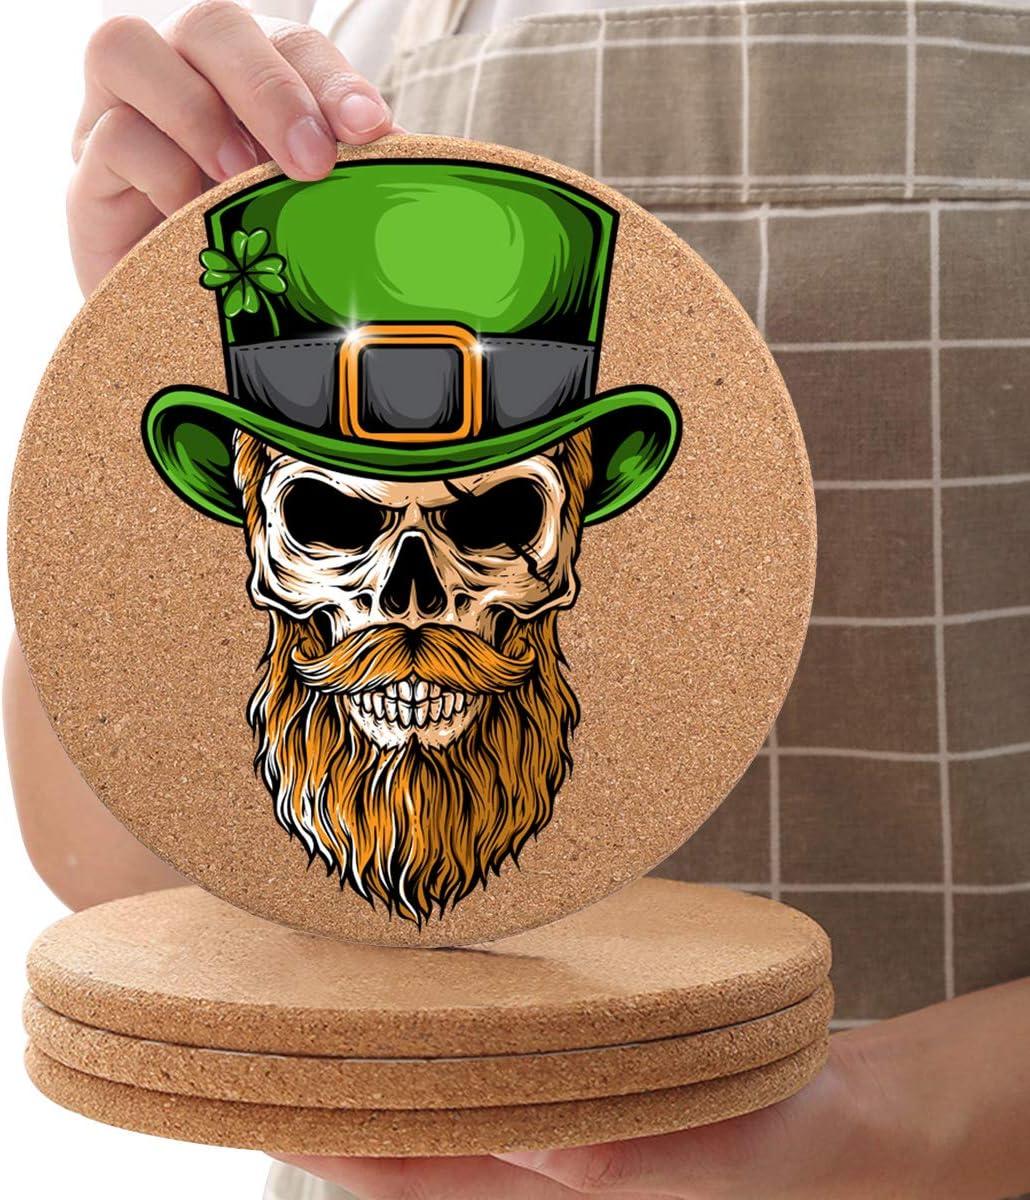 16 Pcs St. Patrick's Day Finally popular brand Seasonal Wrap Introduction Coaster Cork Trivets 6.3inch Diameter